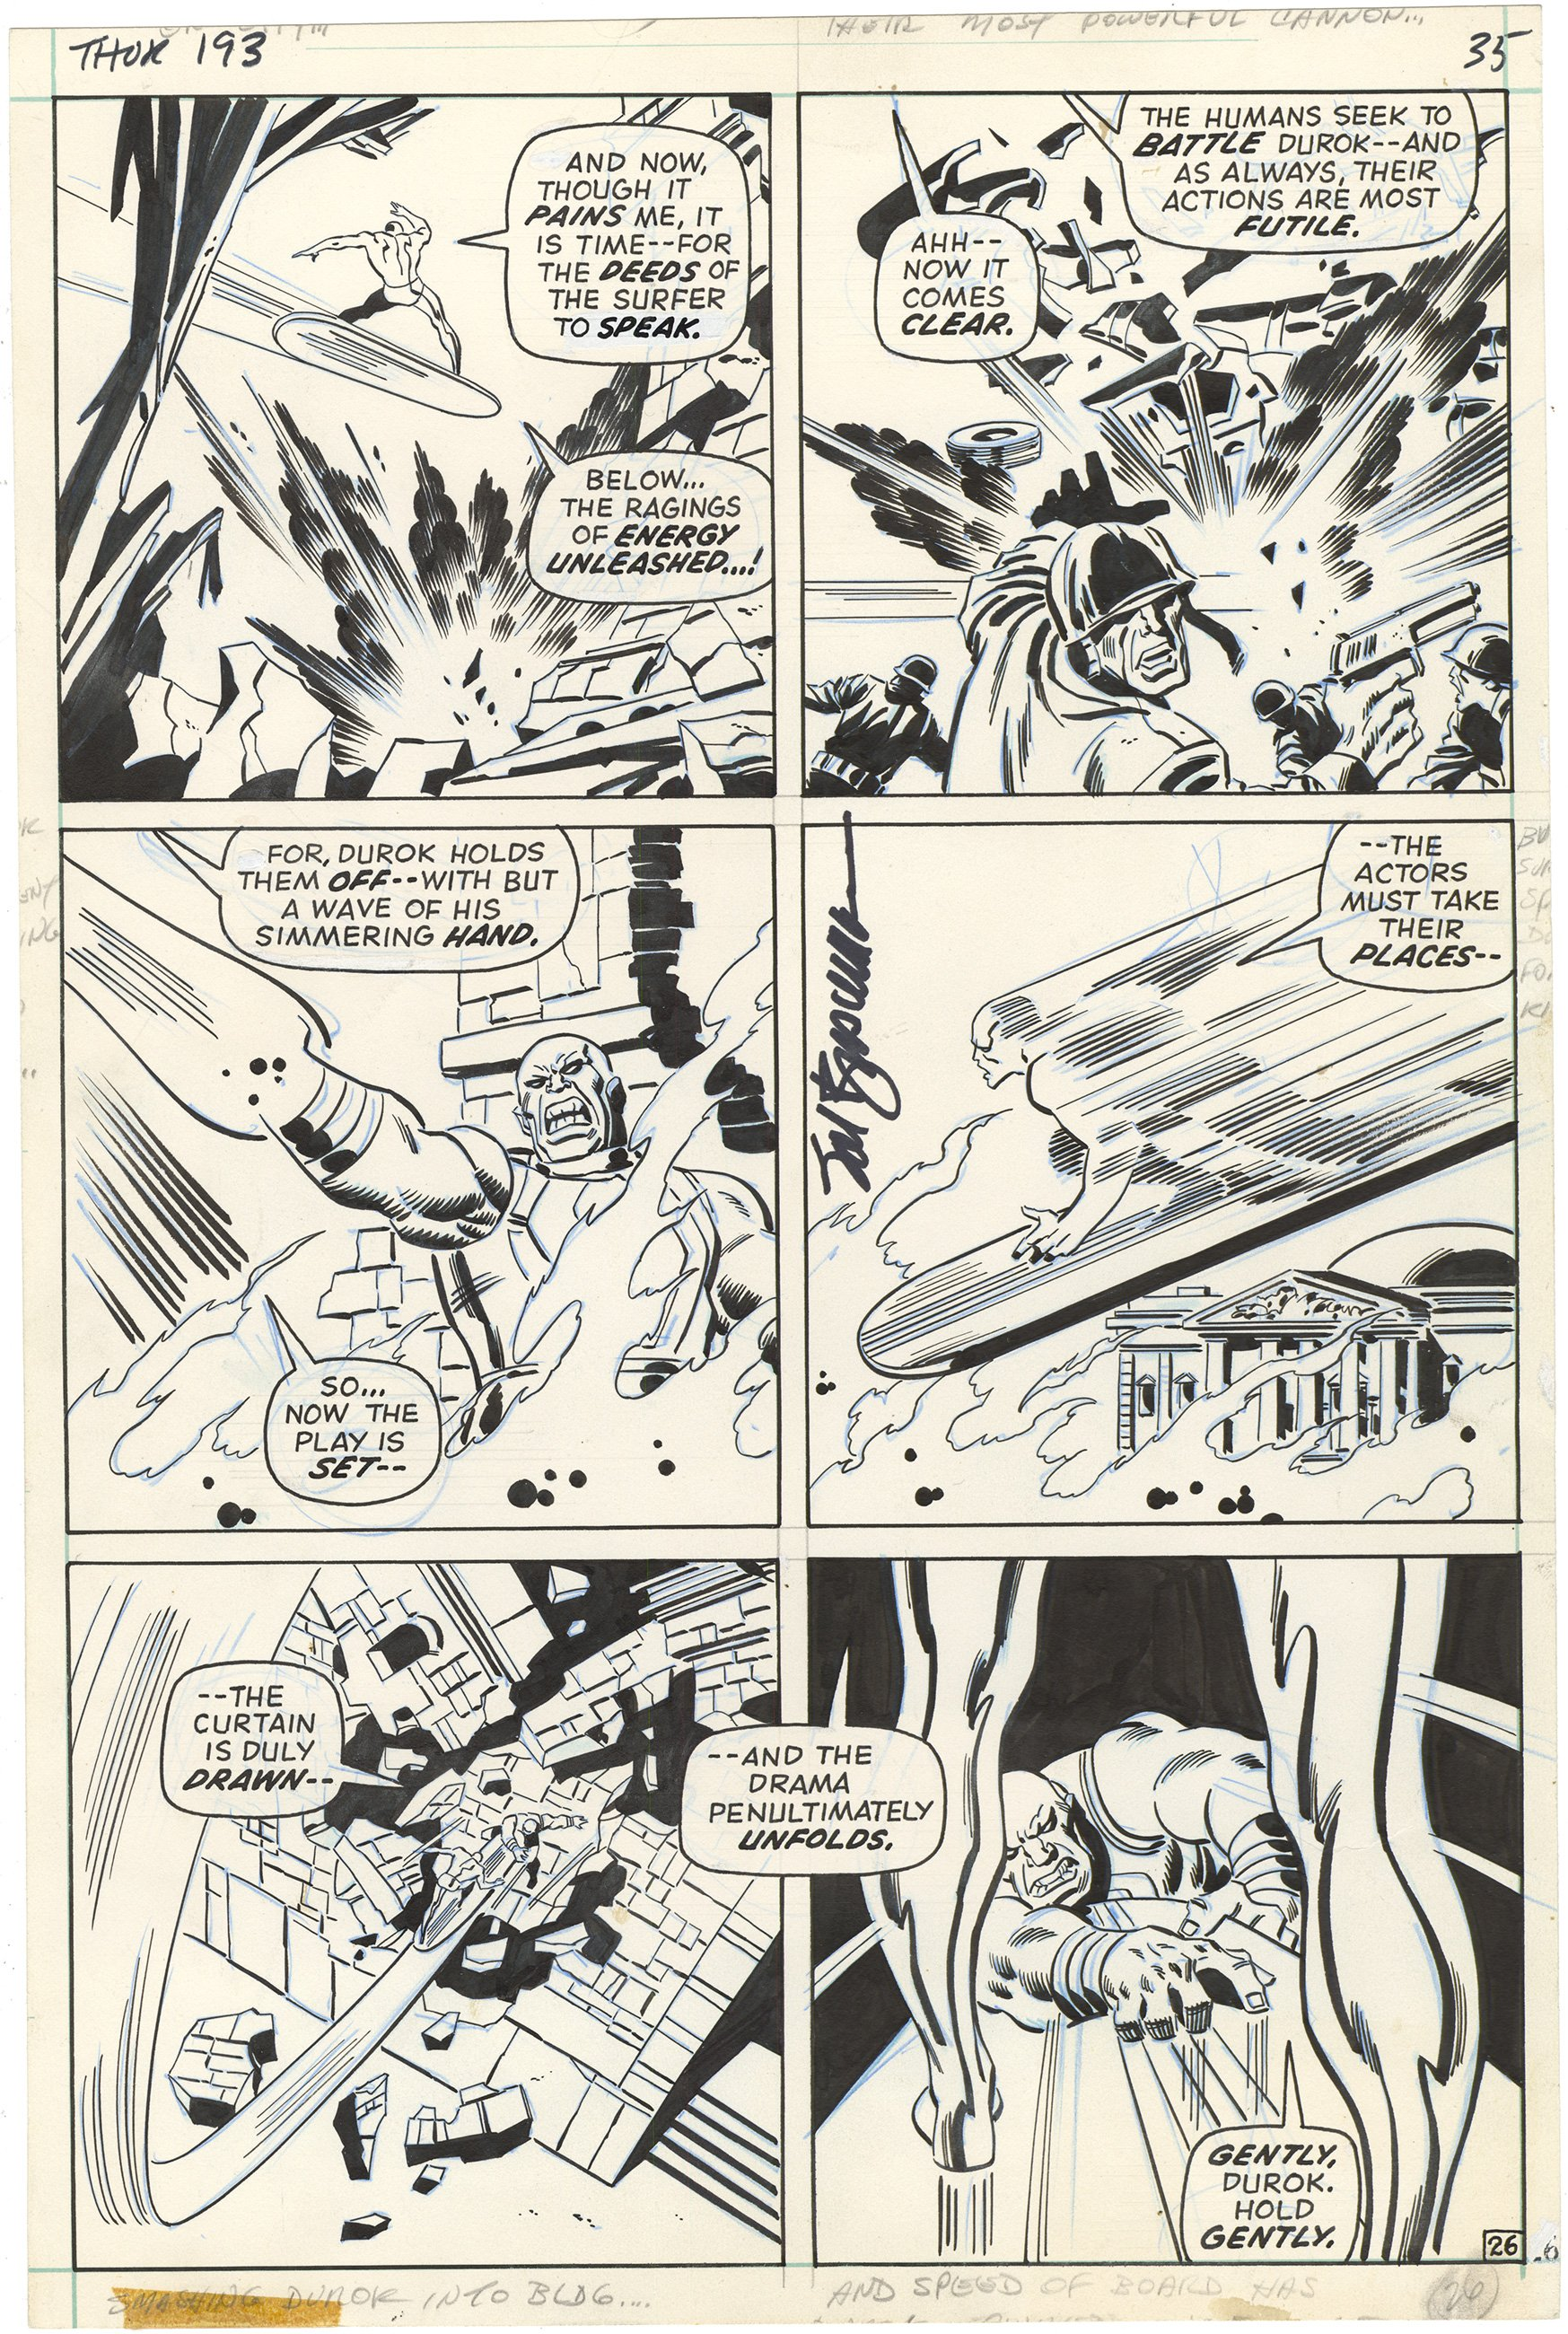 Thor #193 p26 (Signed)